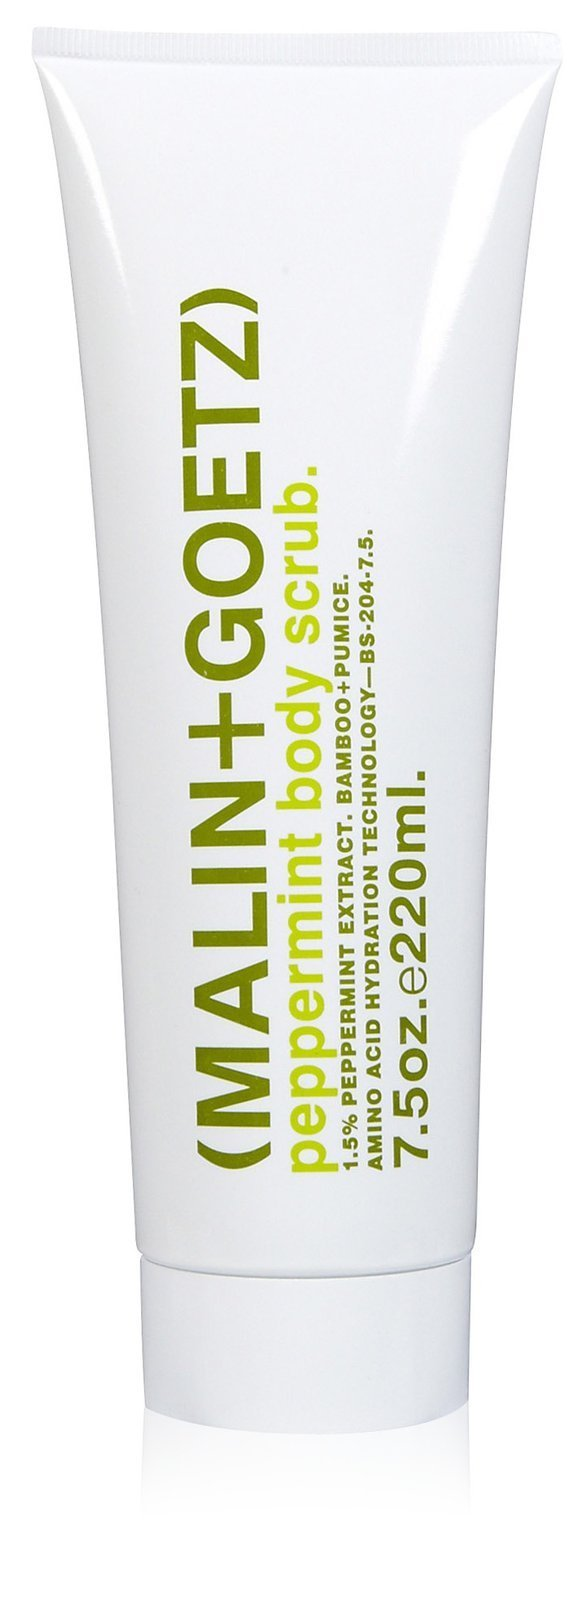 Malin + Goetz Body Scrub, Peppermint, 7.5 Ounce